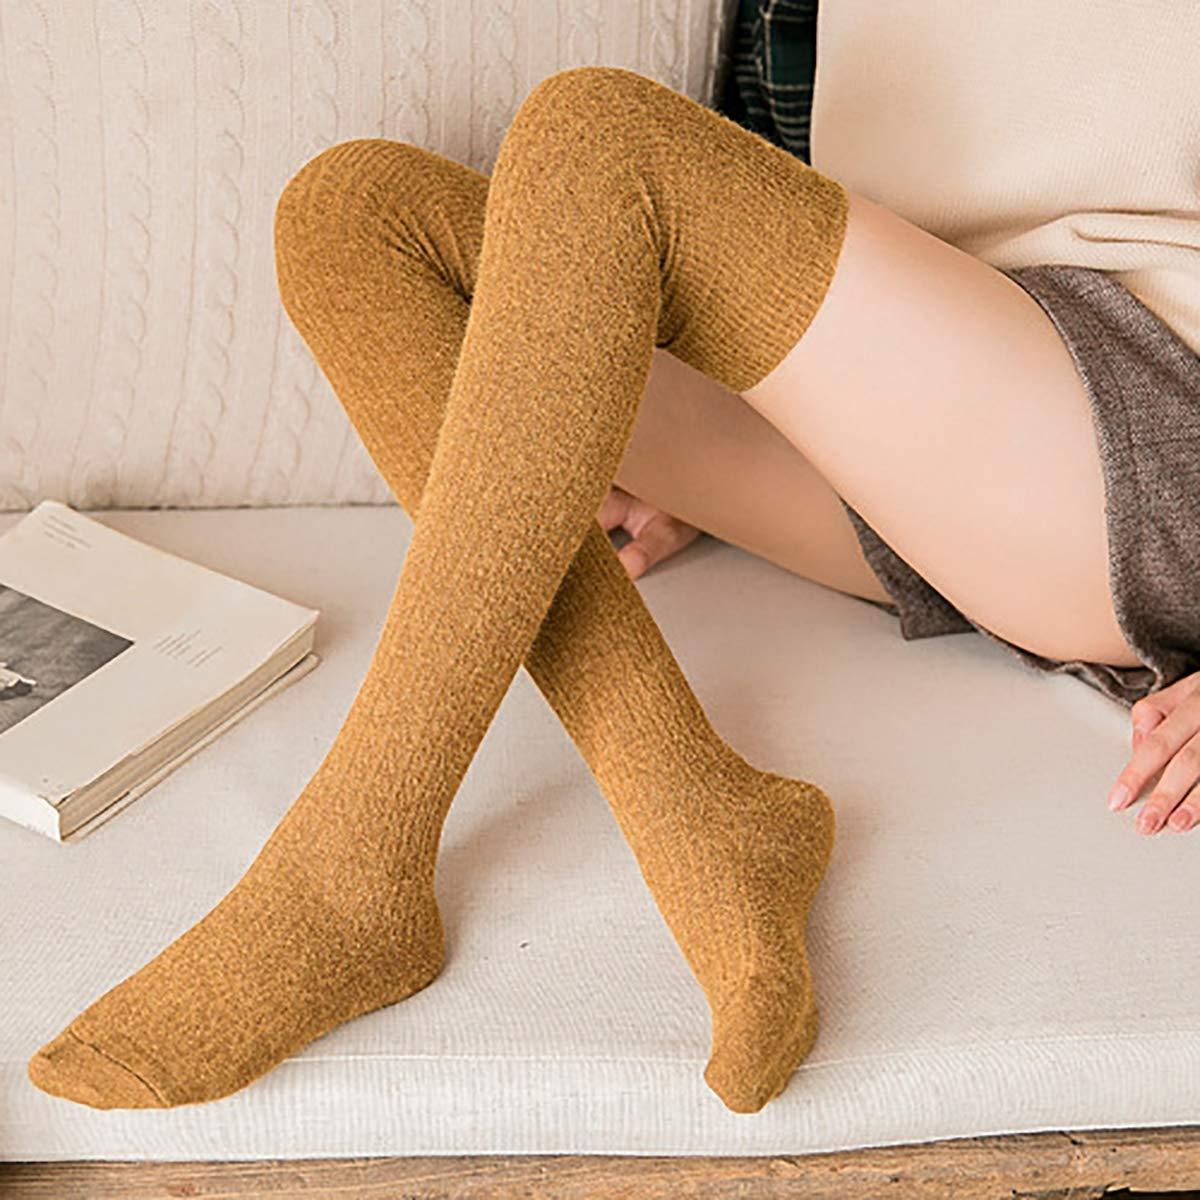 wear tumblr sexy